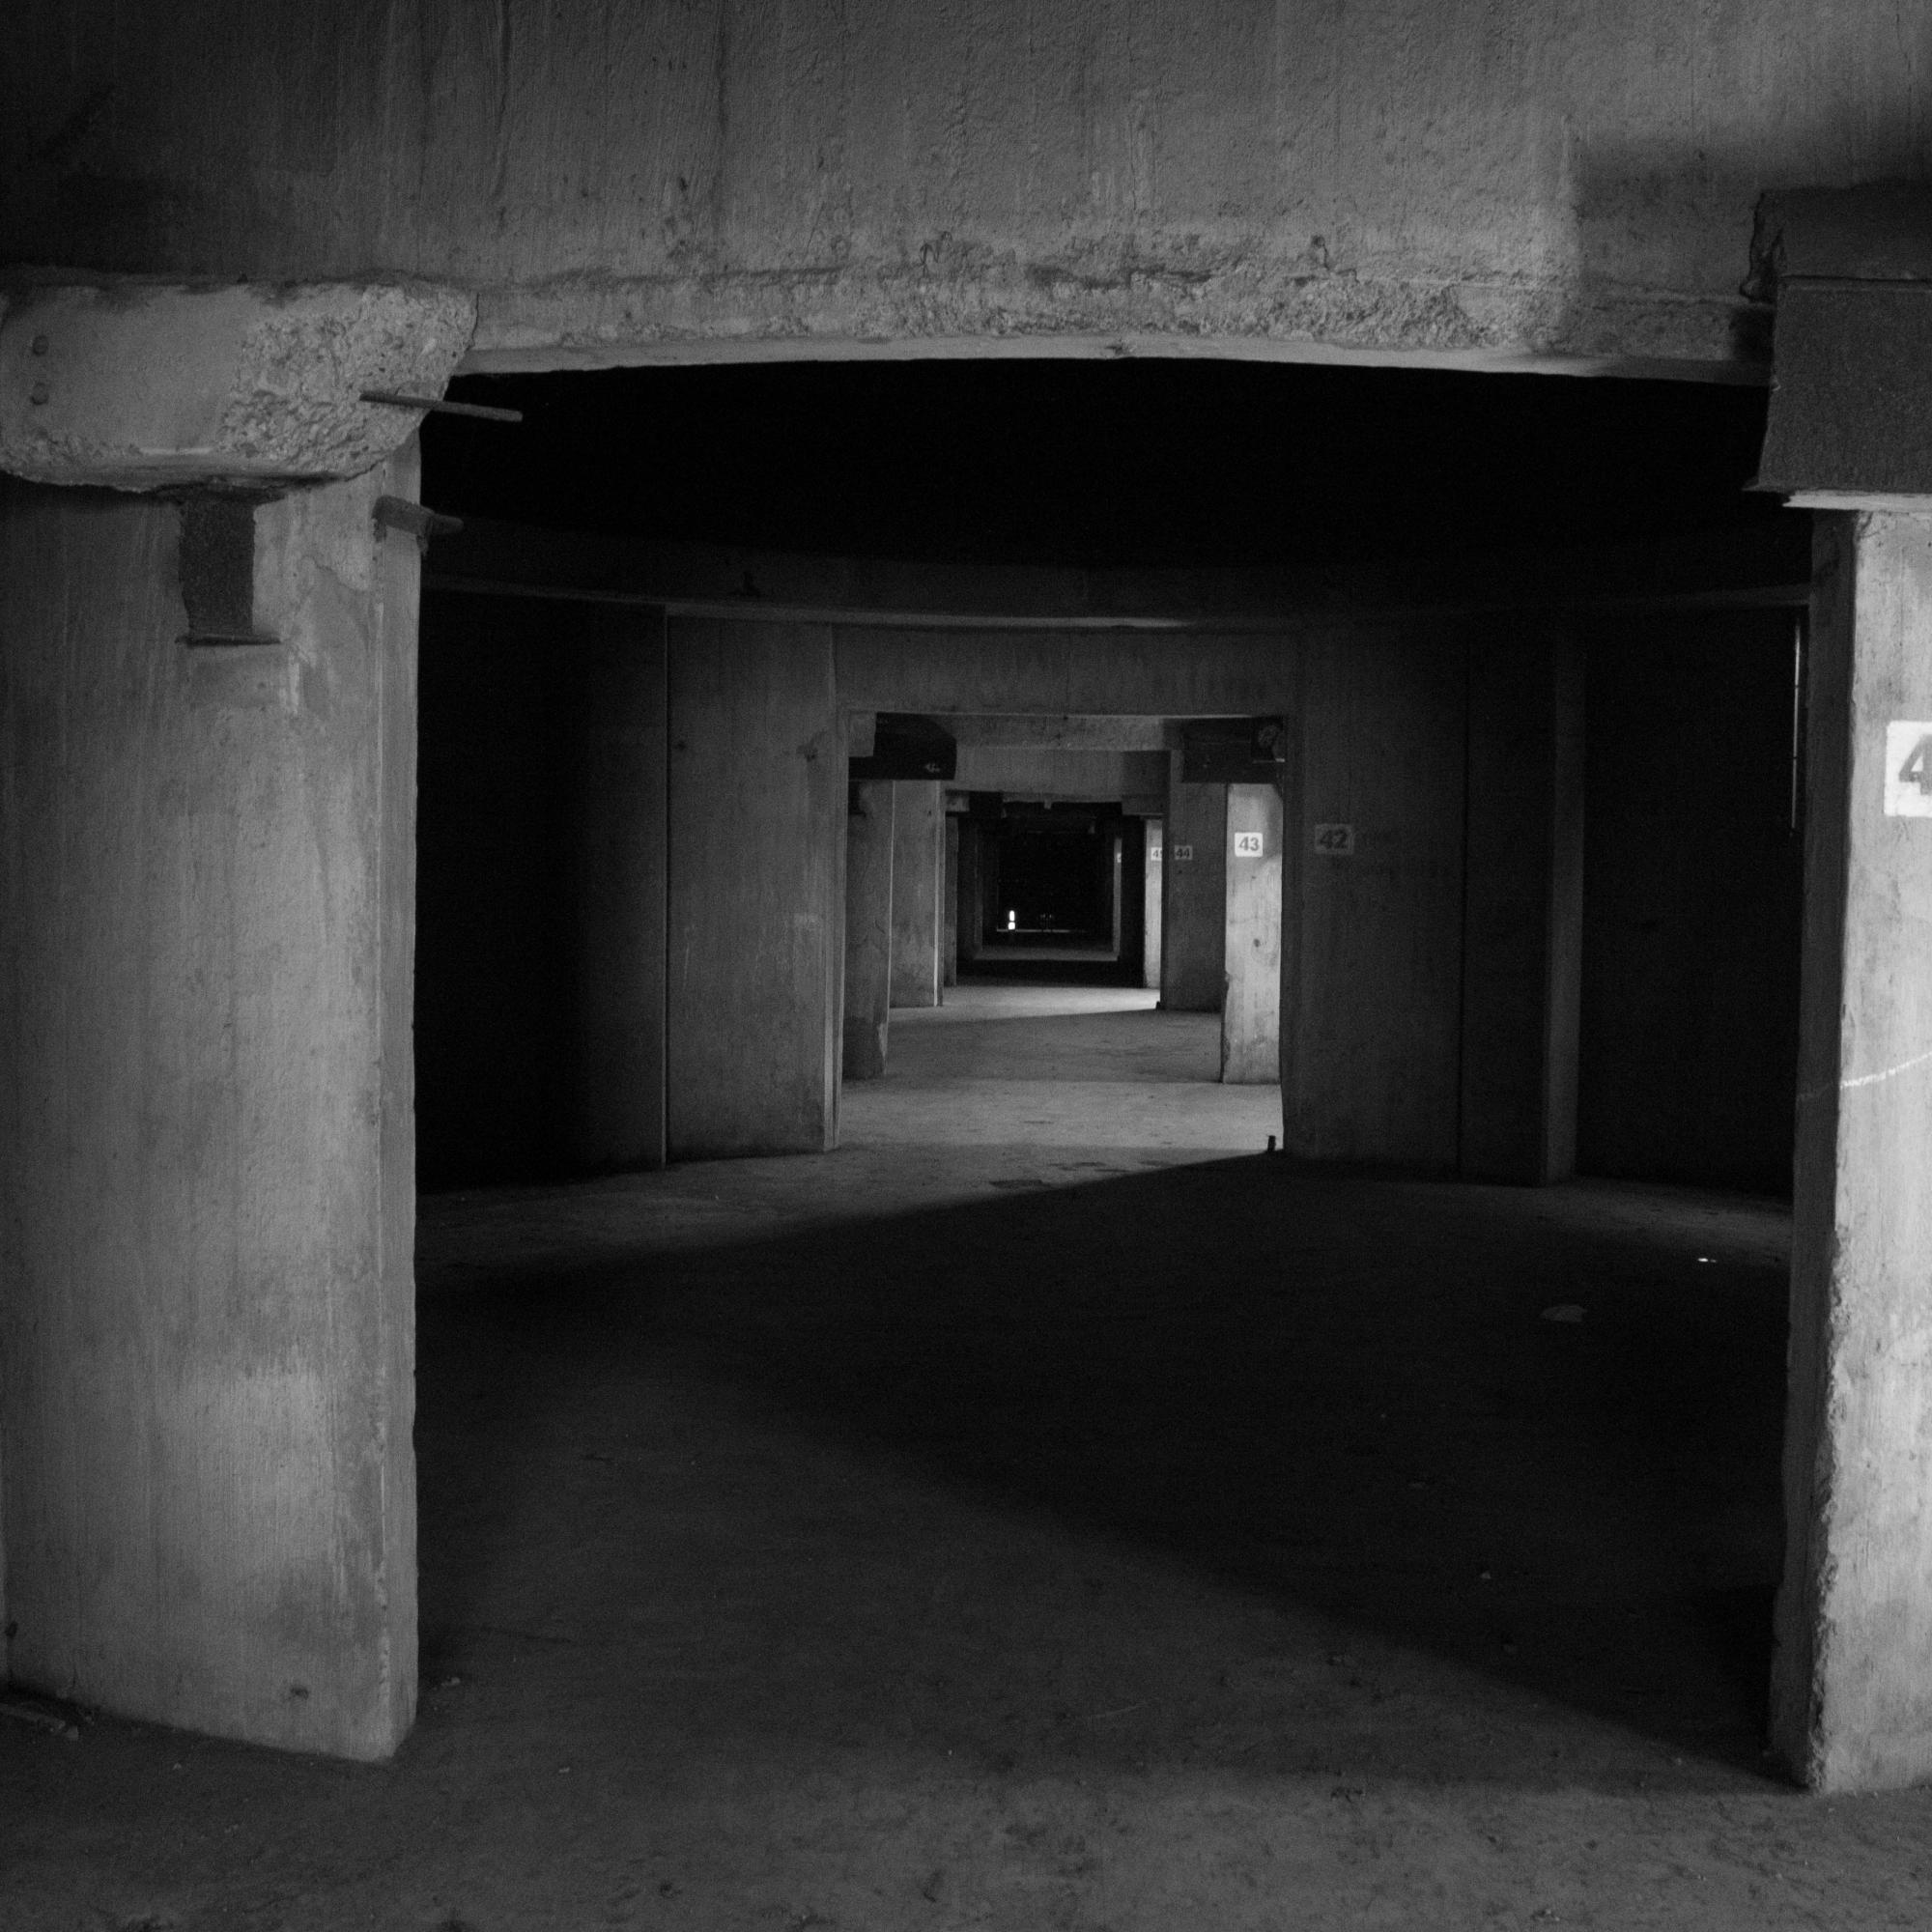 BW Hallway